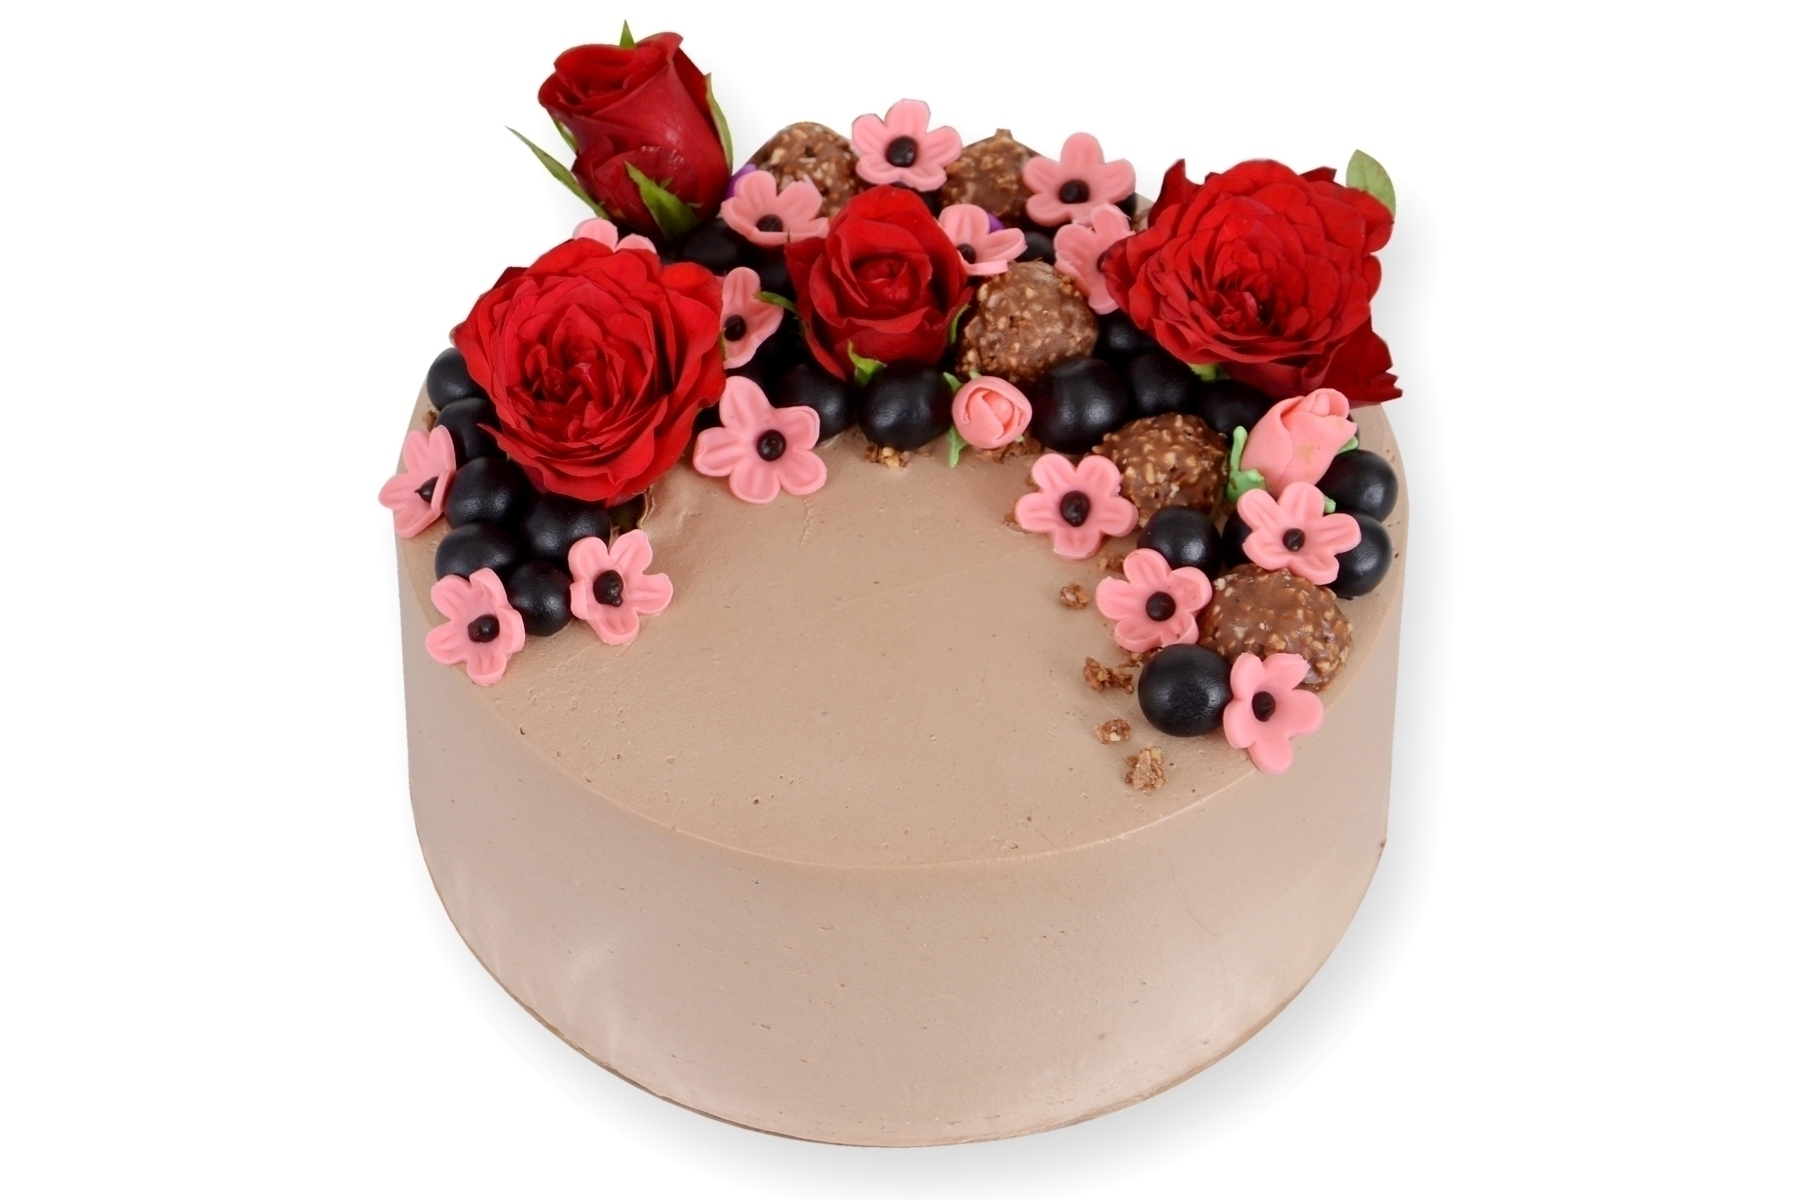 Special Celebration Semi Fondant Cake in Pune Designs, Images, Price